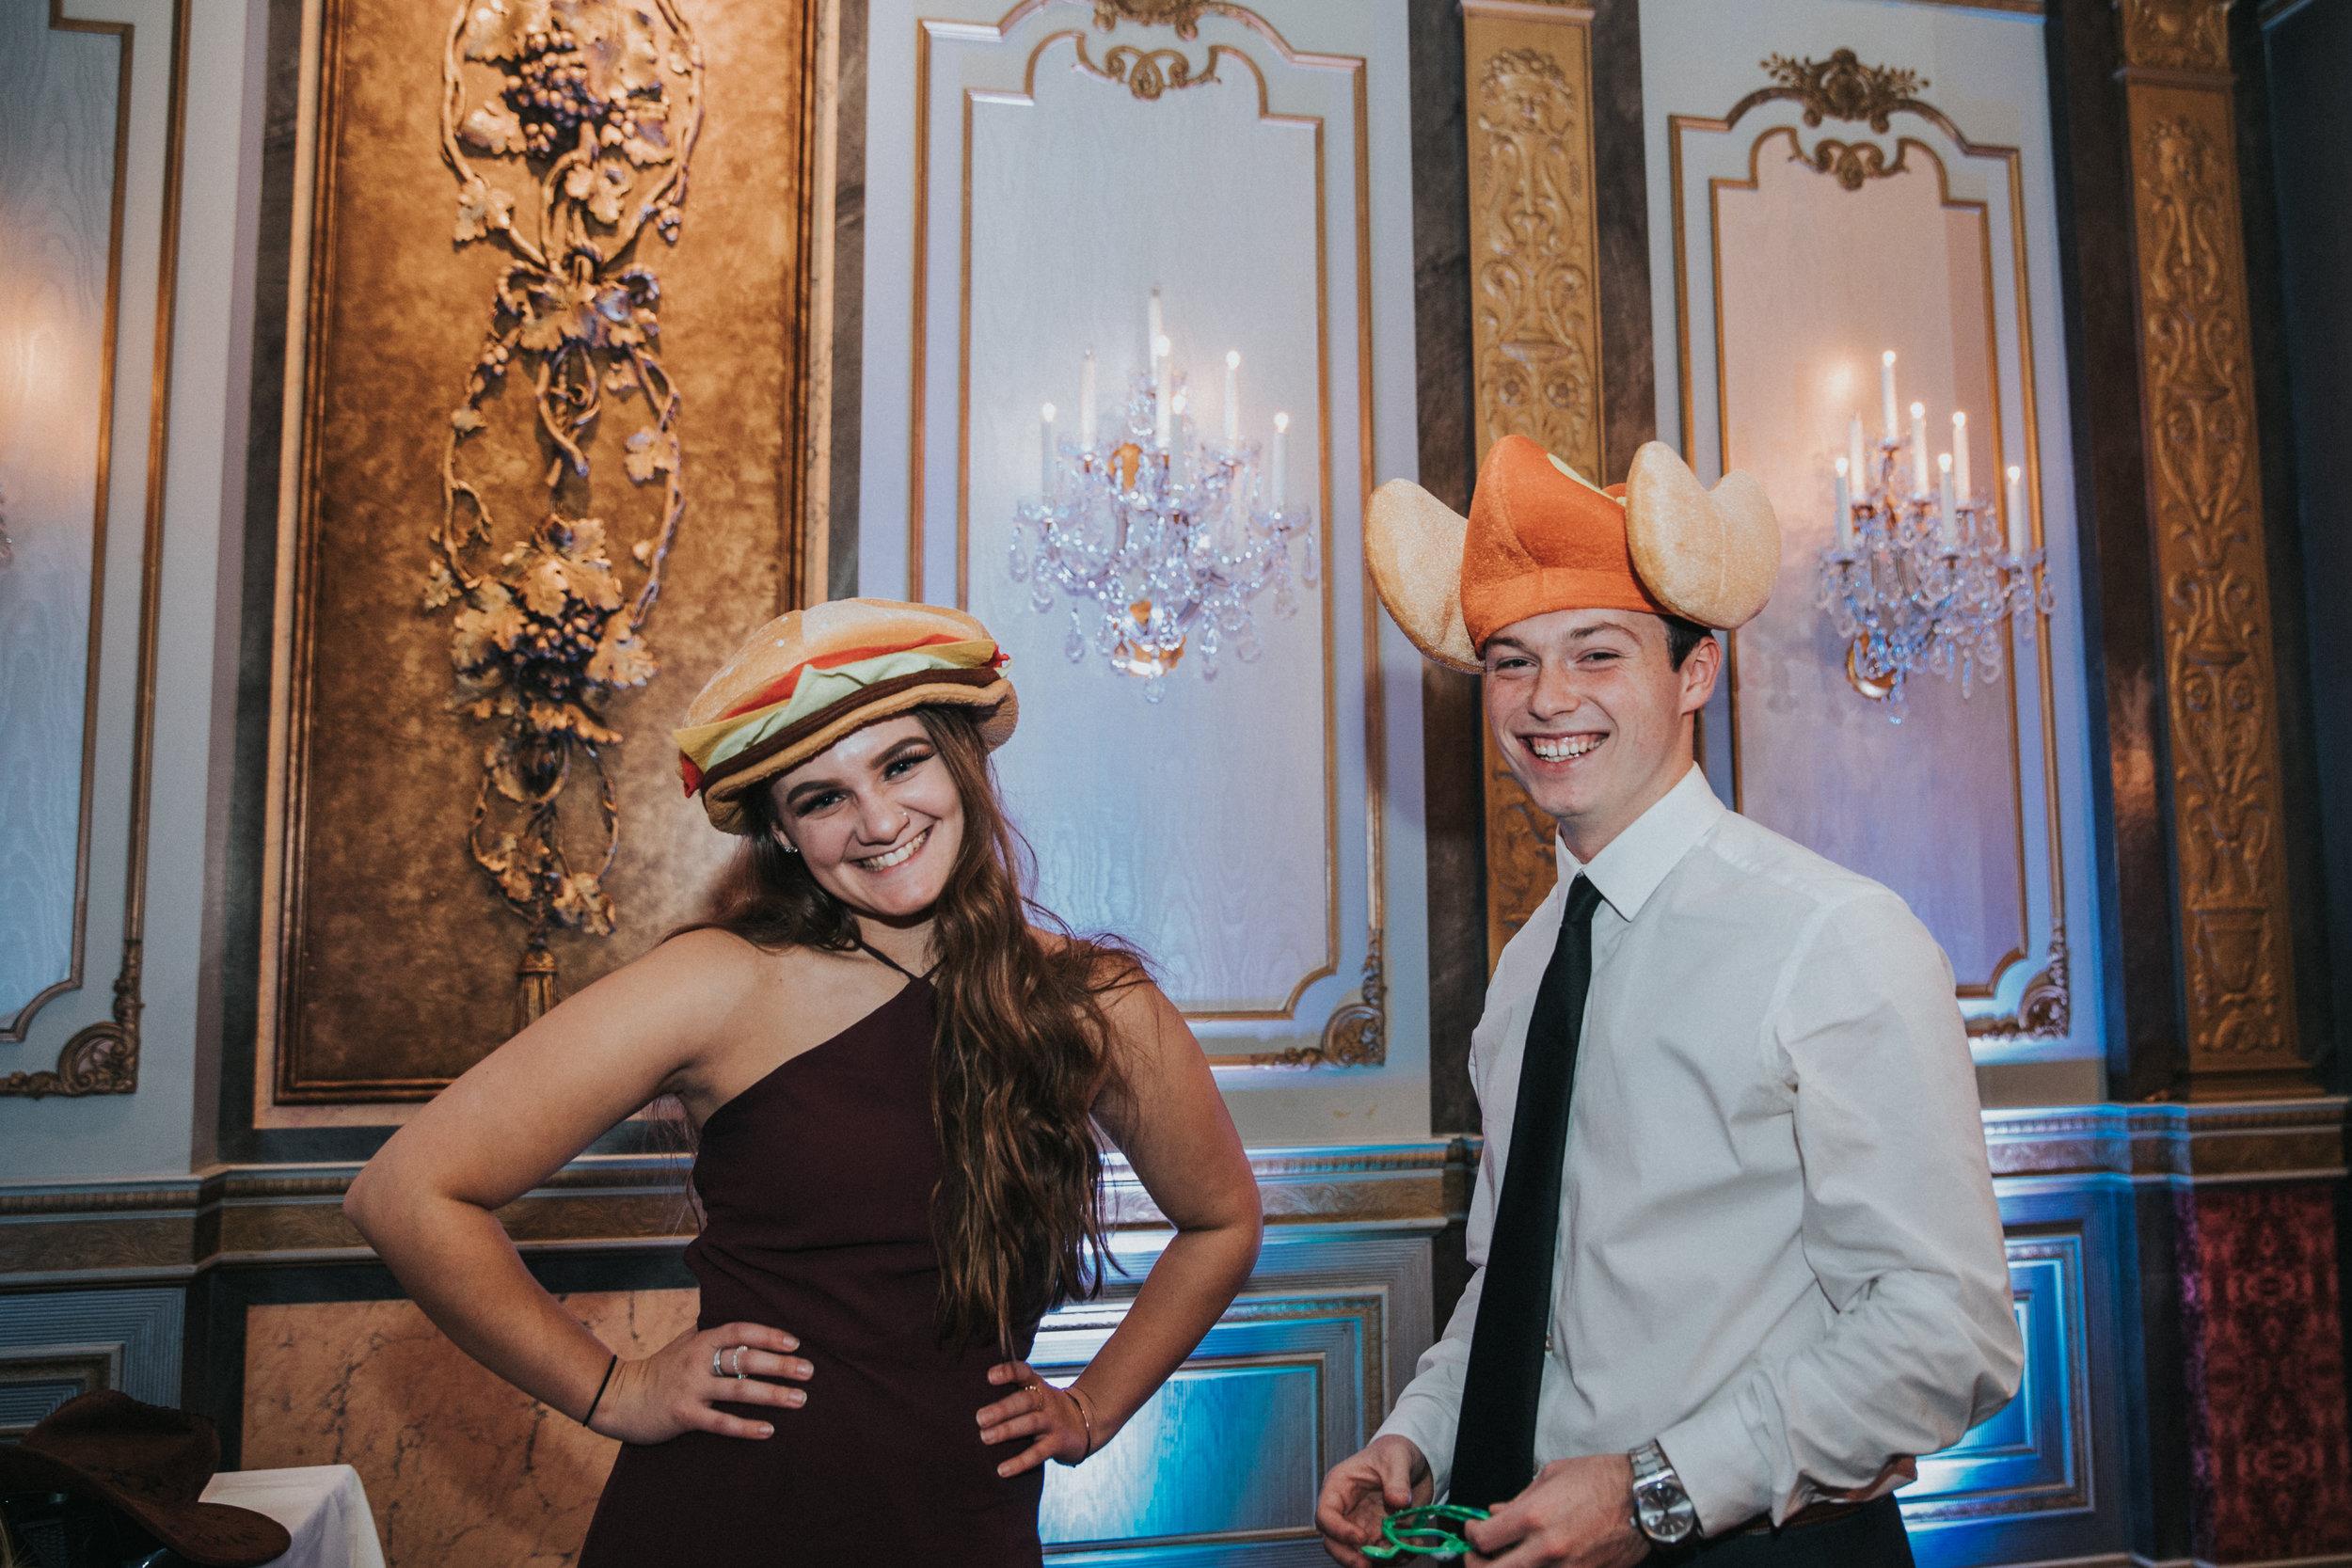 New-Jersey-Wedding-Photography-Fishers-Tudor-House-JennaLynnPhotography-Reception-Kathleen&Eddie-181.jpg